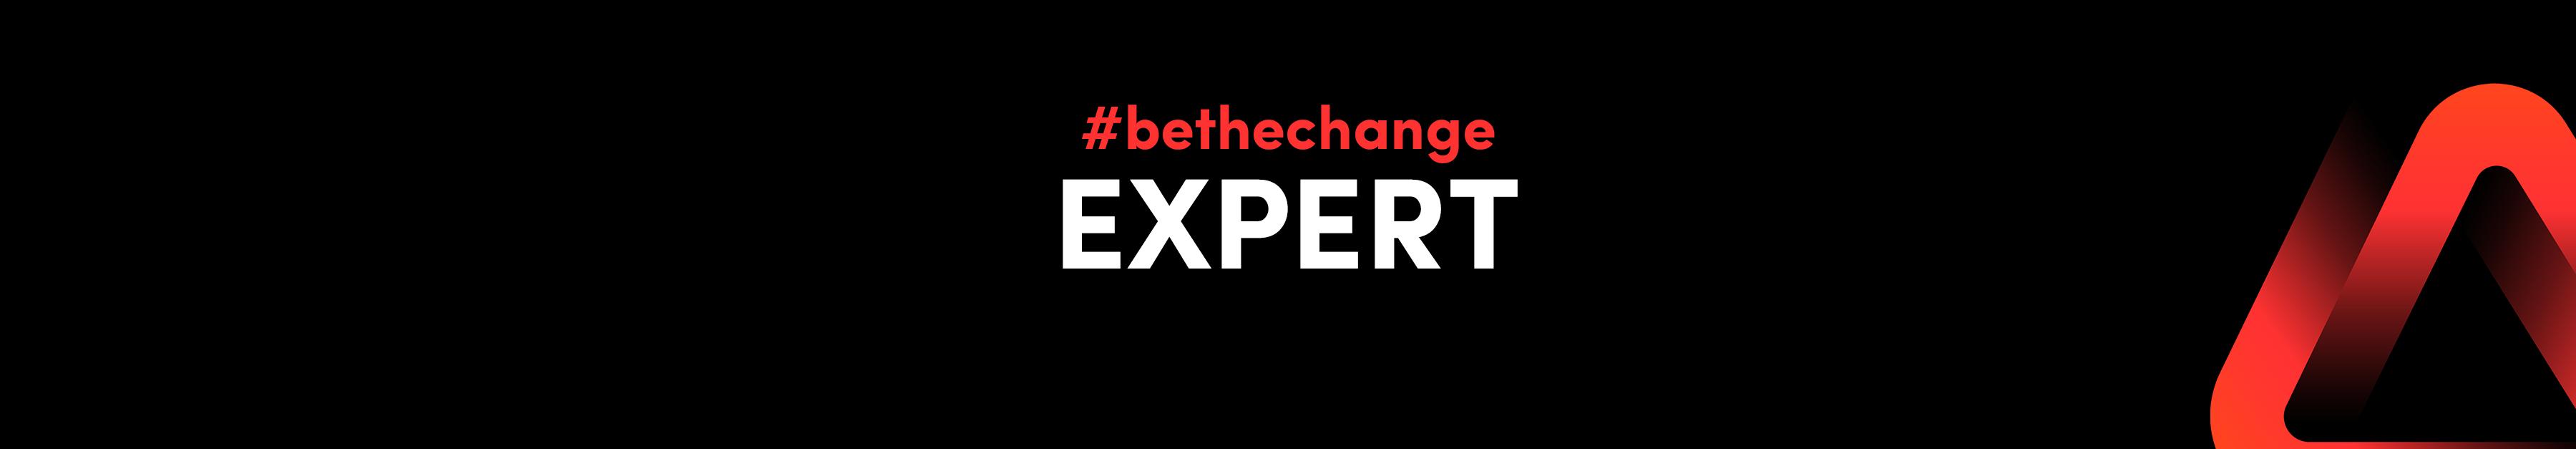 #bethechange Expert application 1